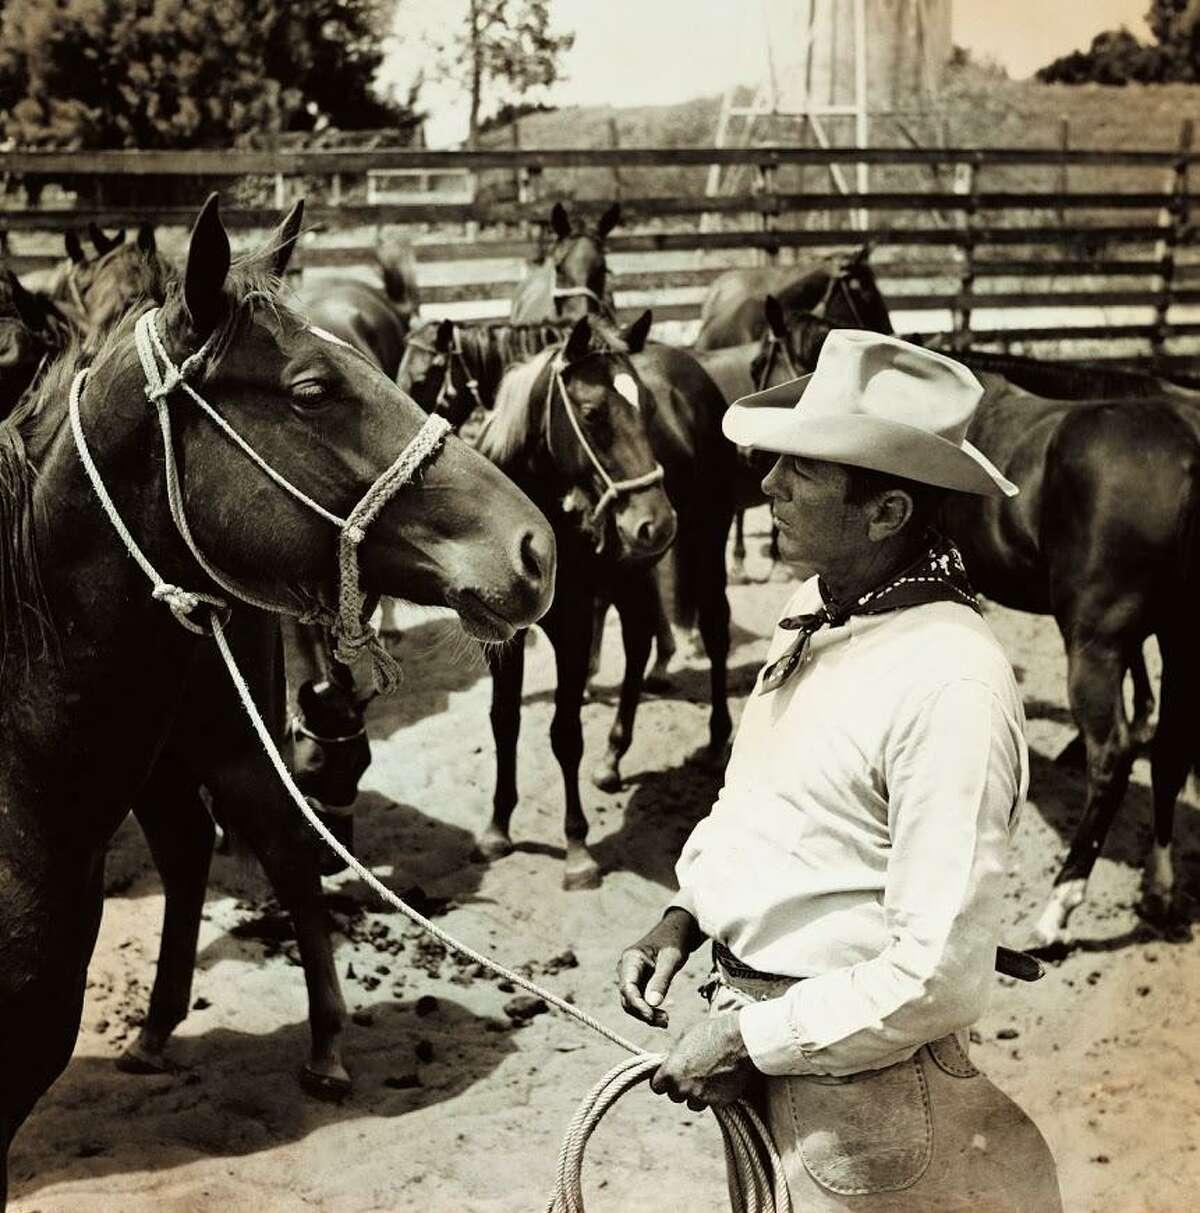 Bob Kleberg Jr. had a way with horses, including these mares, circa 1941.